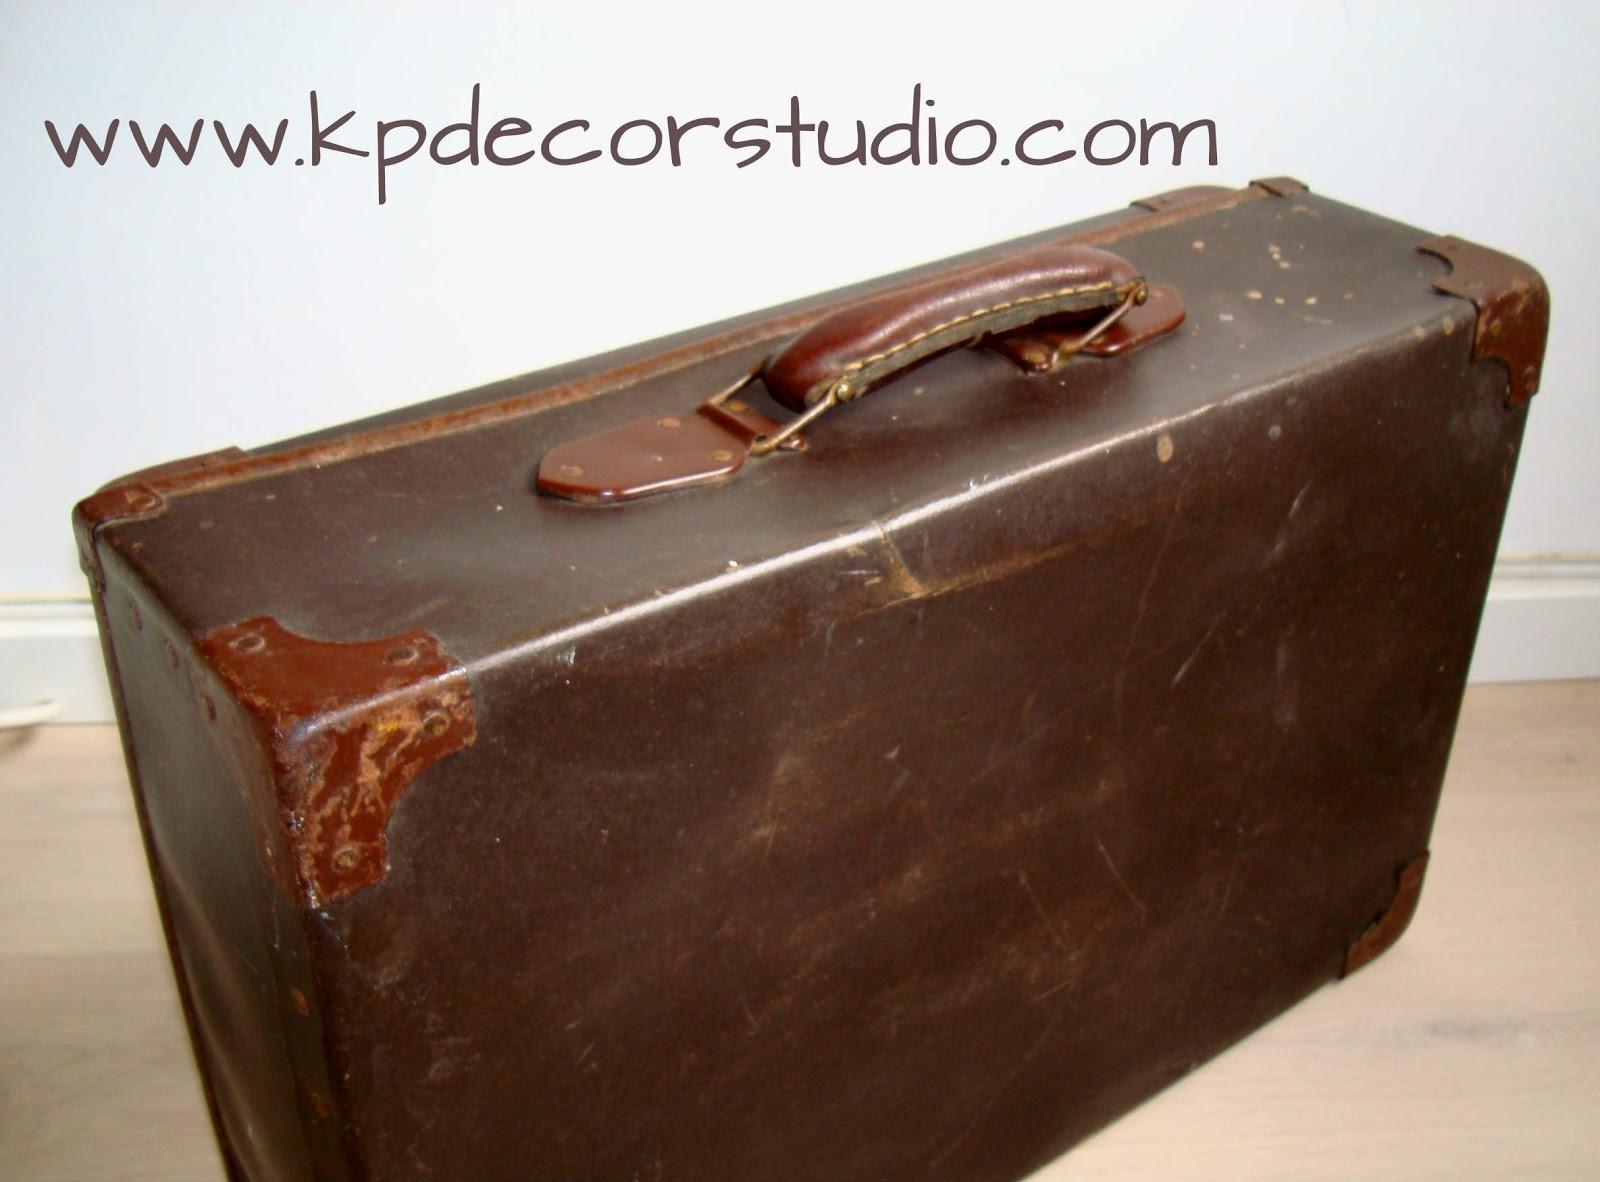 Kp tienda vintage online maleta antigua a os 30 old for Maletas antiguas online